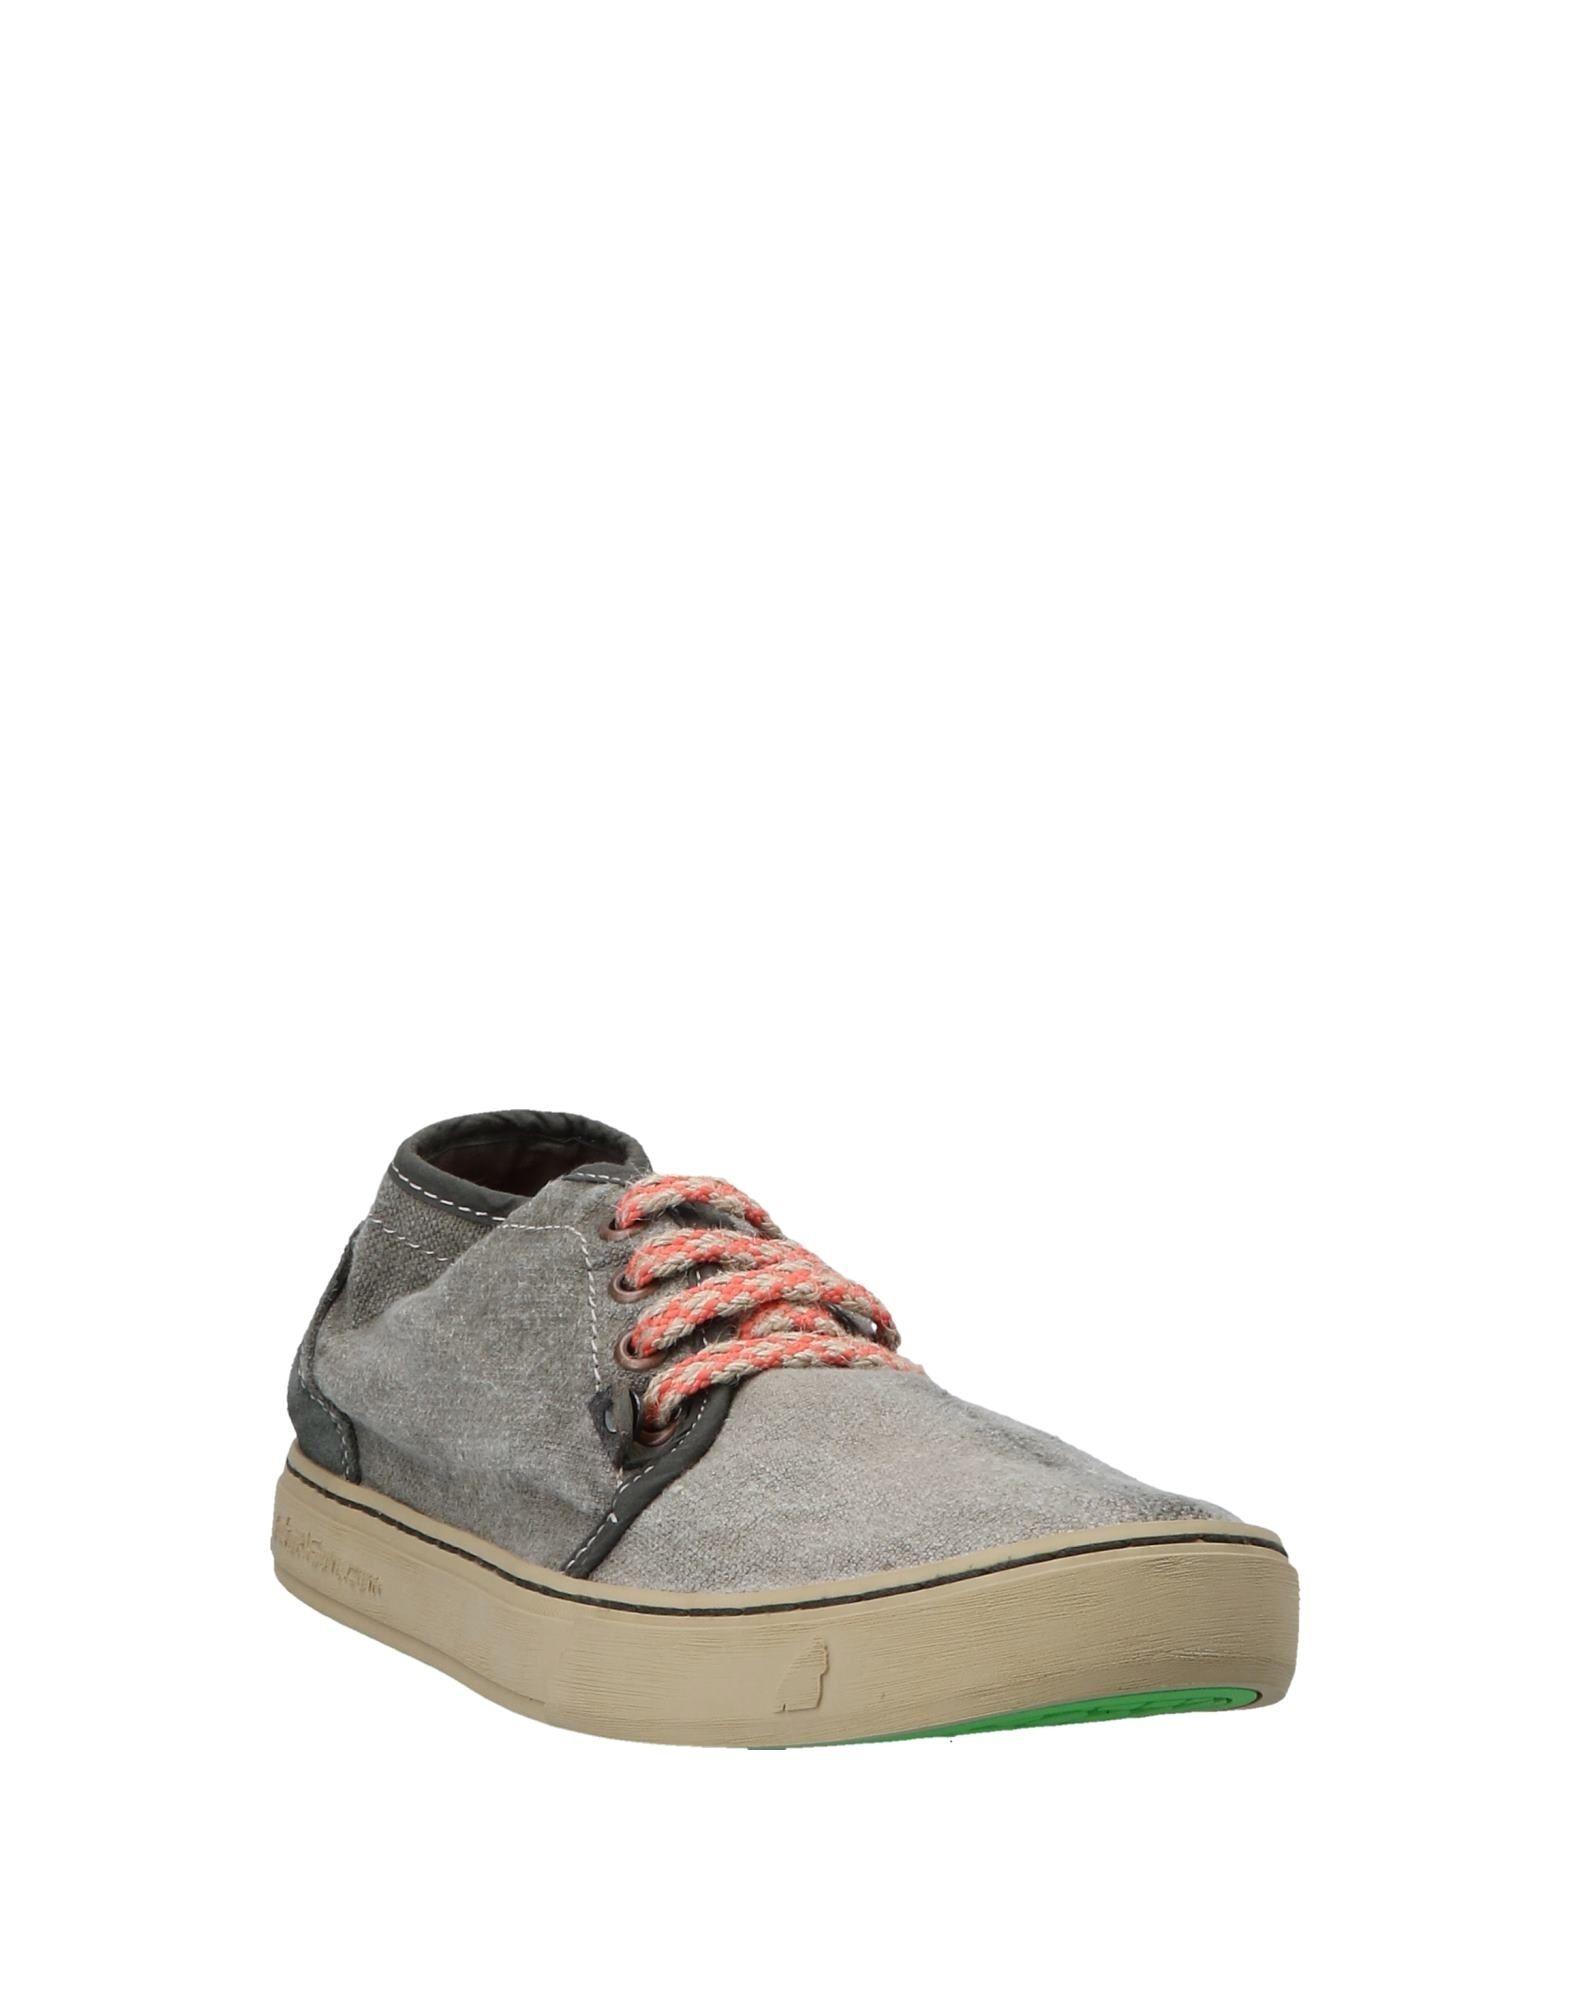 Satorisan Sneakers Herren Herren Sneakers  44796601QG 75e3e8